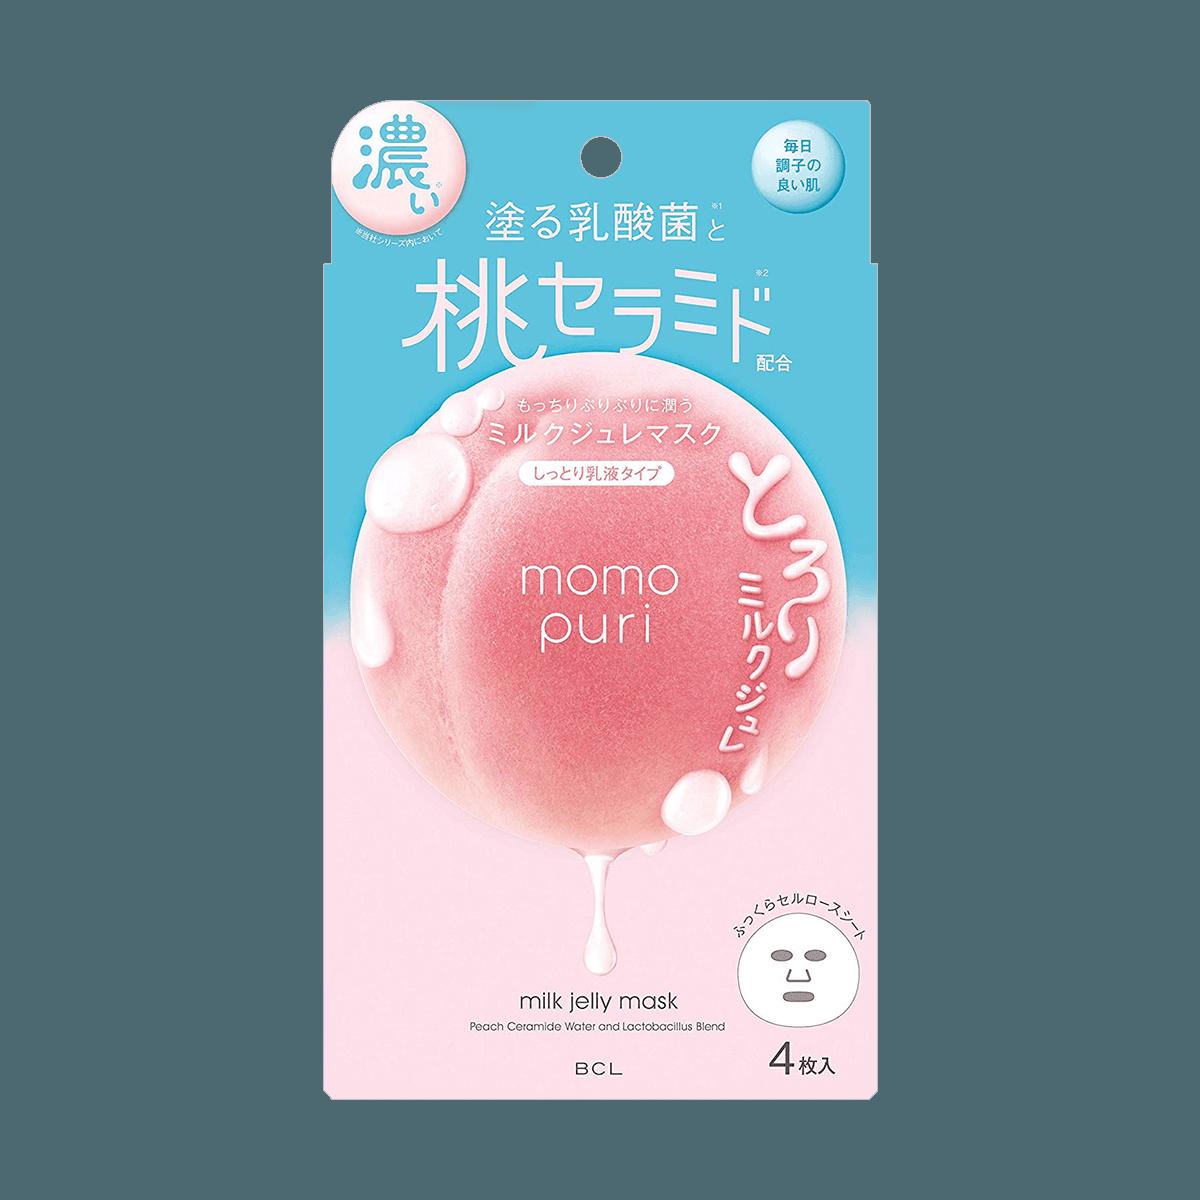 Yamibuy.com:Customer reviews:MOMO PURI Jelly Mask 4pcs